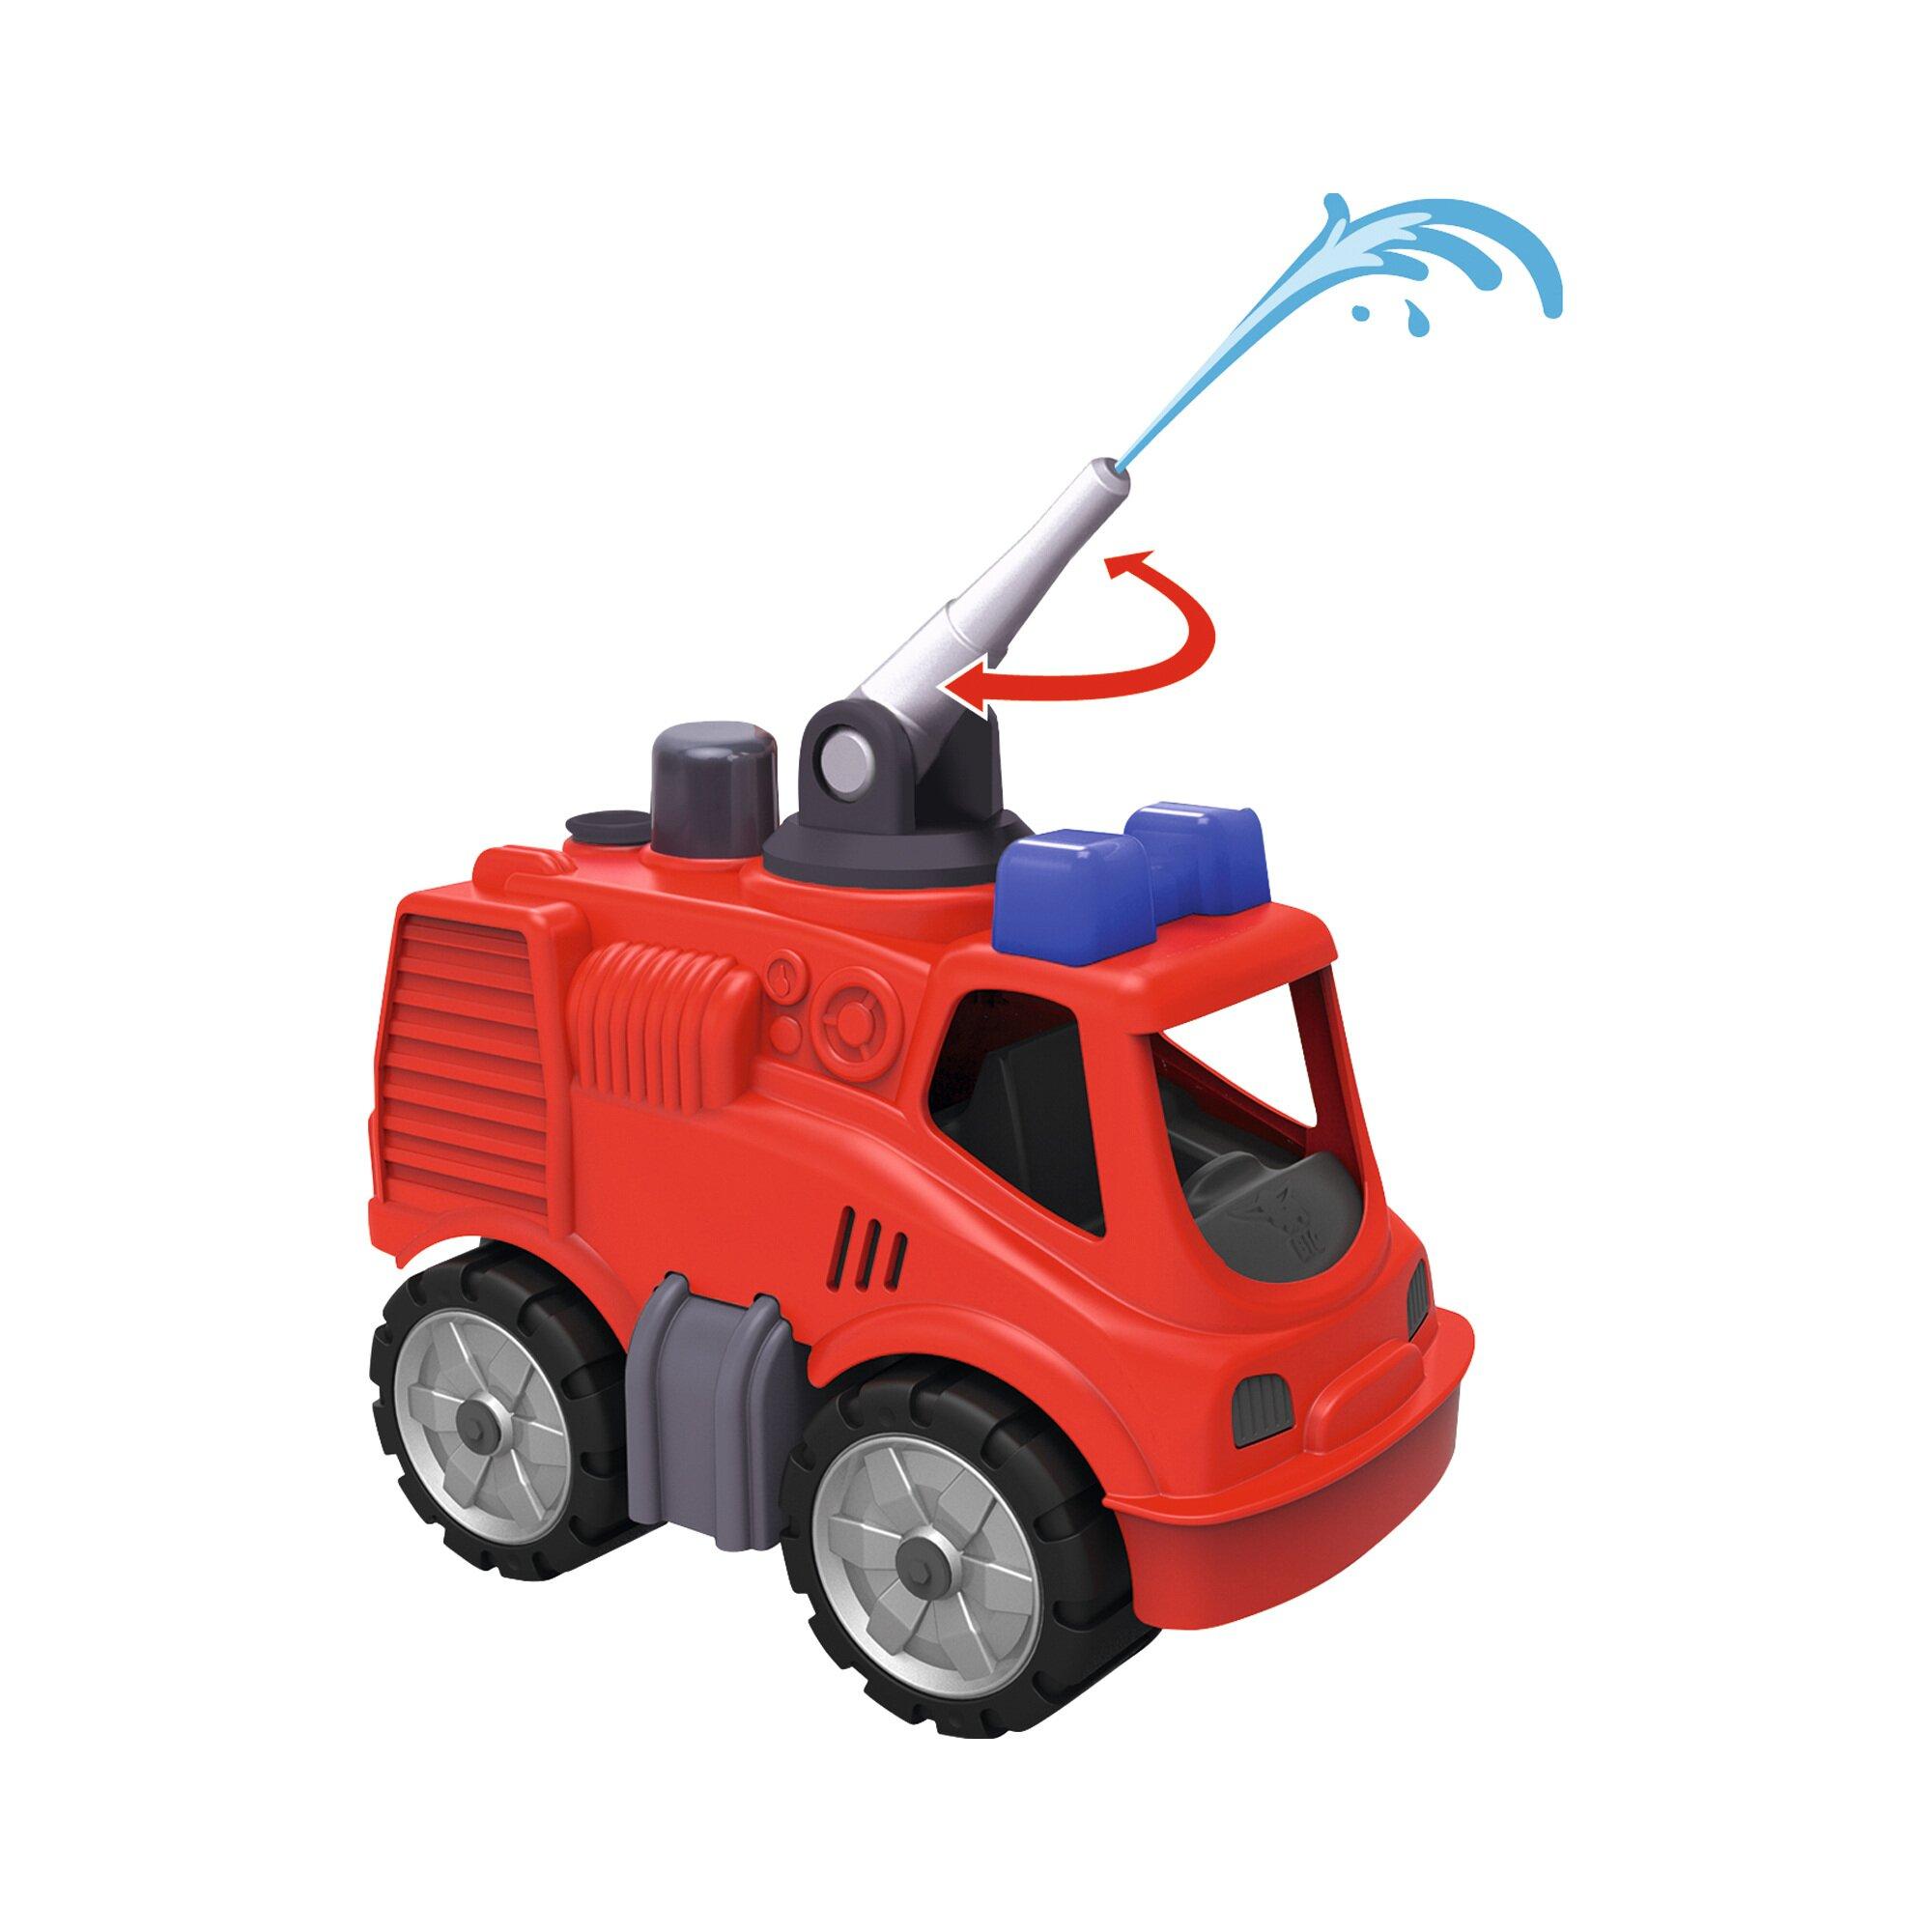 big-power-worker-mini-feuerwehr